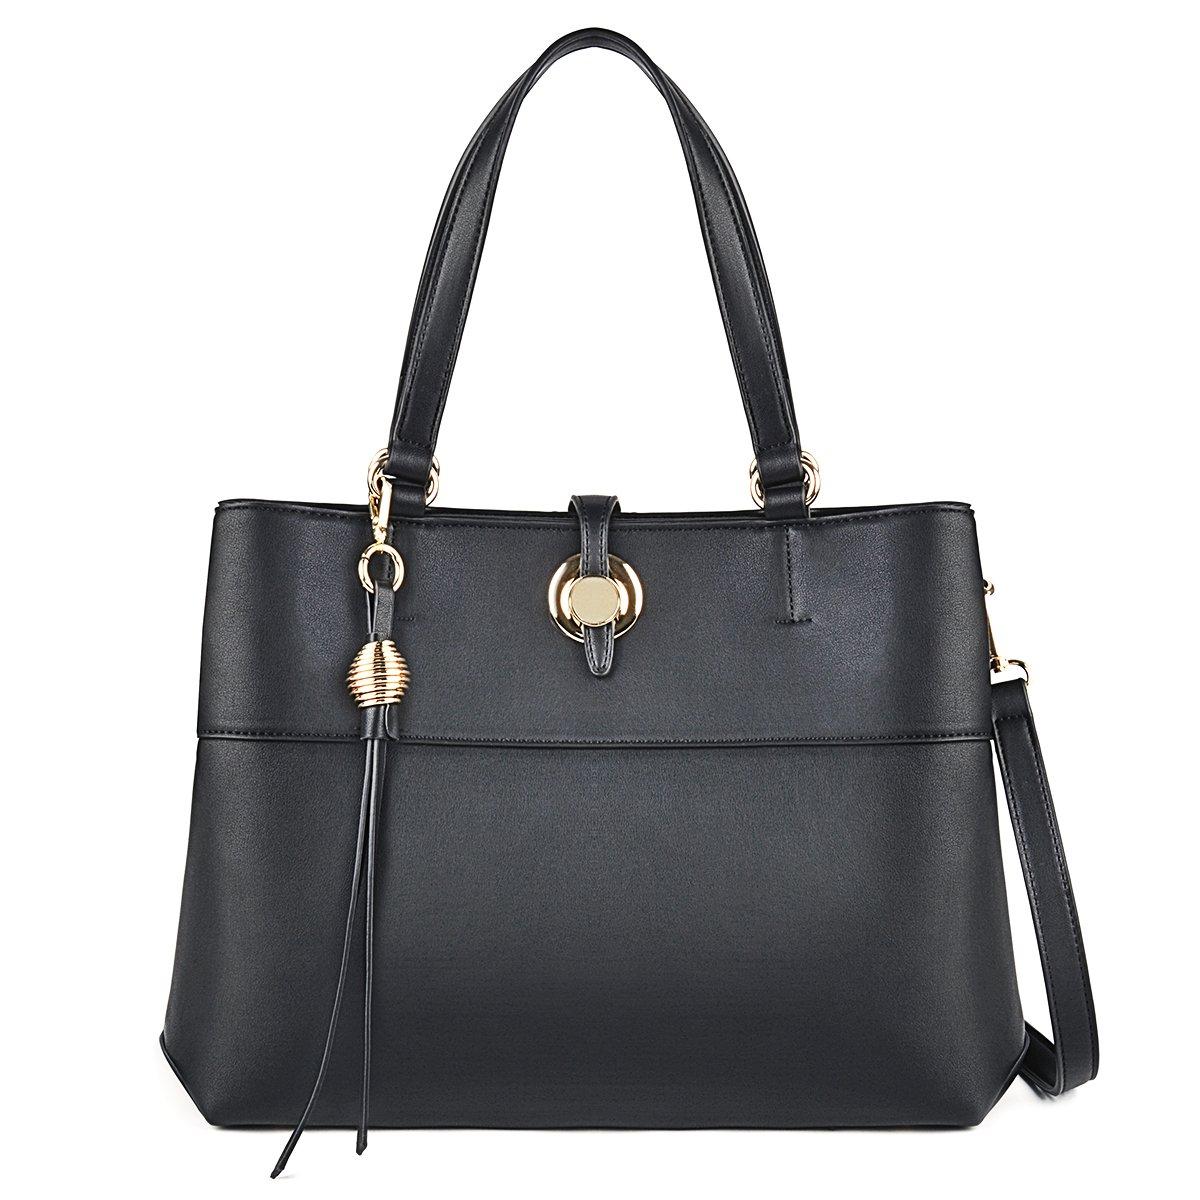 COOFIT Lady Purses and Handbags Little Bow Leisure Top-Handle Bags Shoulder Bag Purse (Handbag Balck)